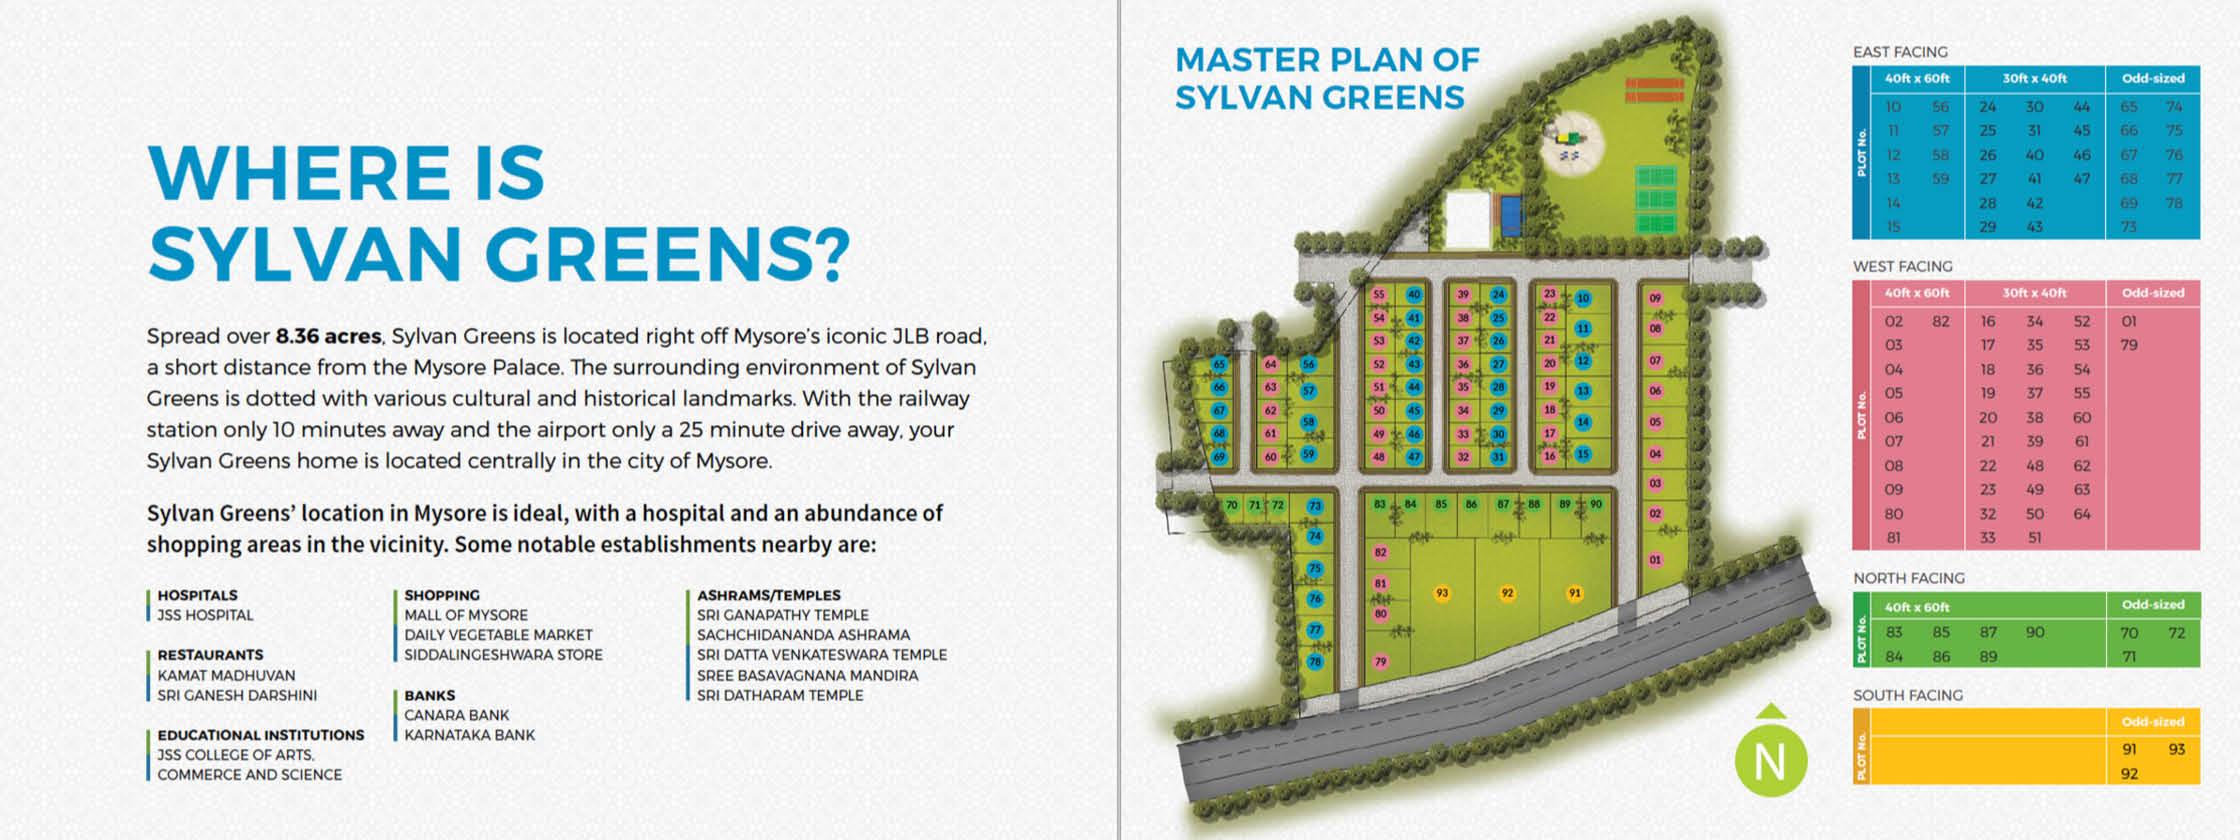 Real Estate ARD Sylvan Greens Brochure Design 21